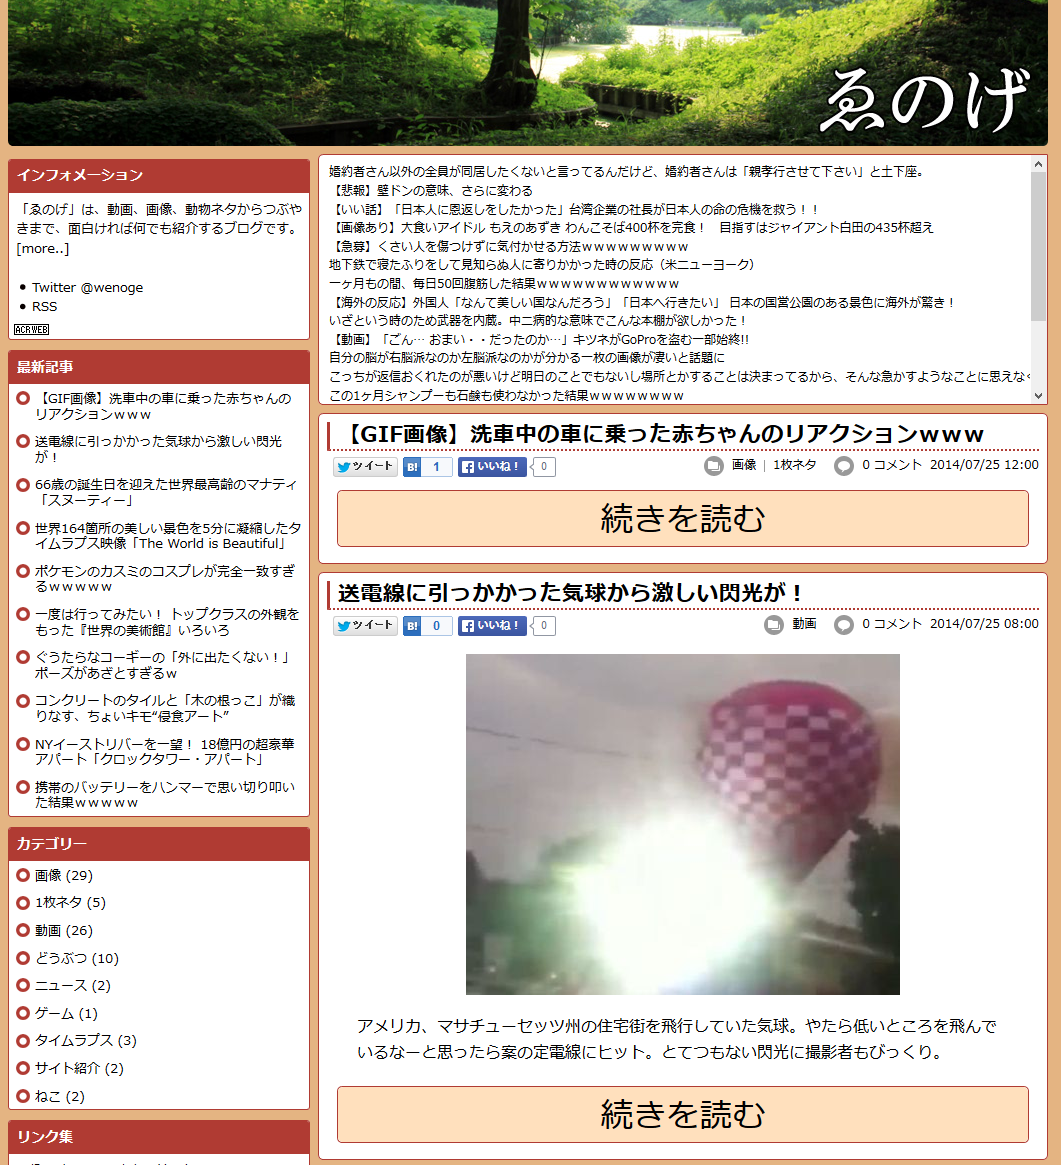 everything is goneさんが新ブログ「ゑのげ」開設